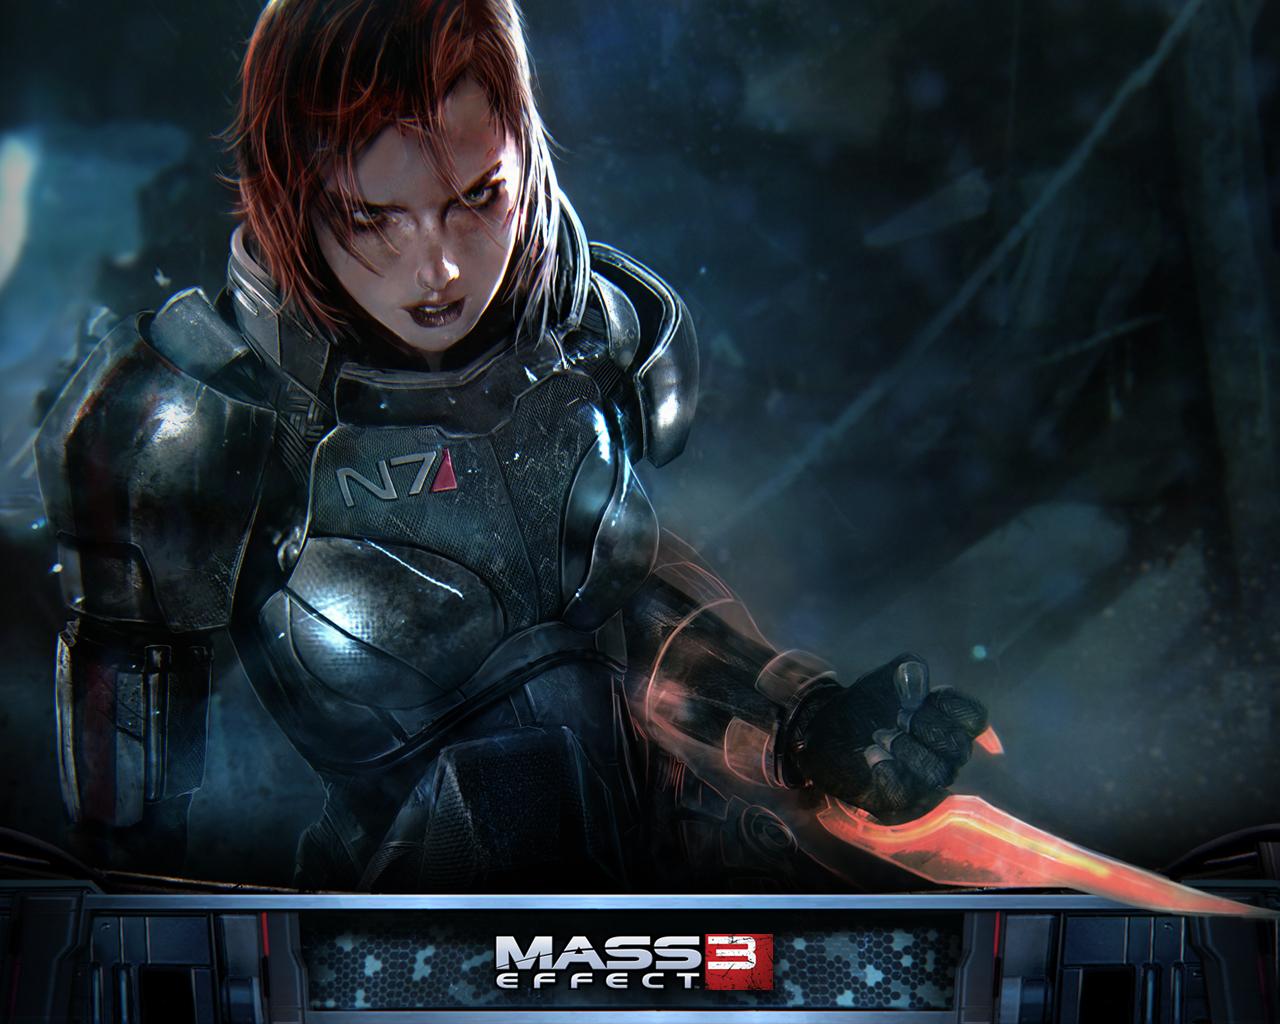 Mass Effect 3  image from  BioWare